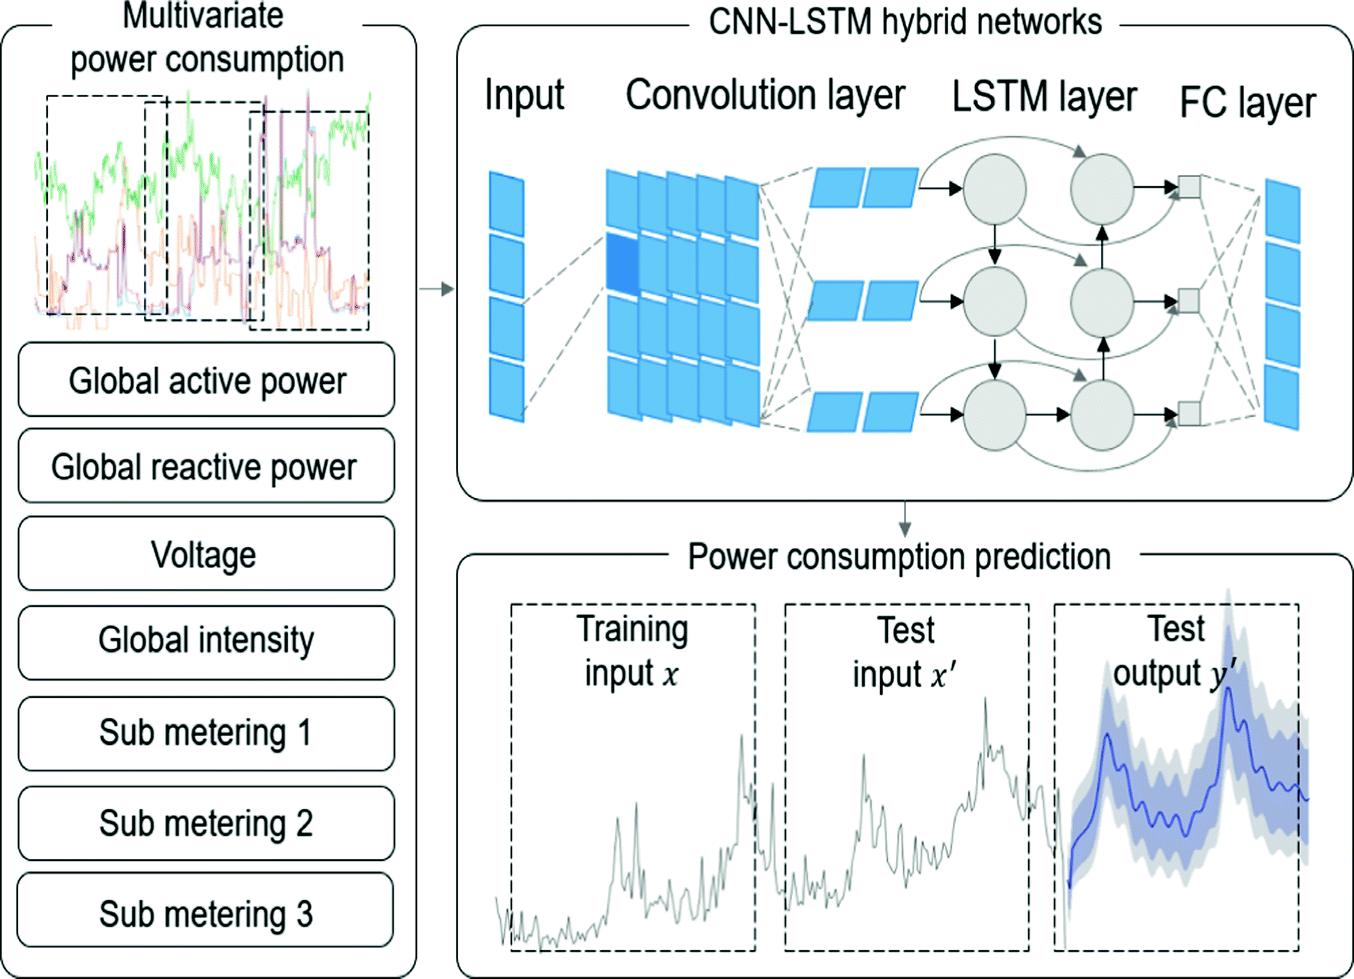 Predicting the Household Power Consumption Using CNN-LSTM Hybrid